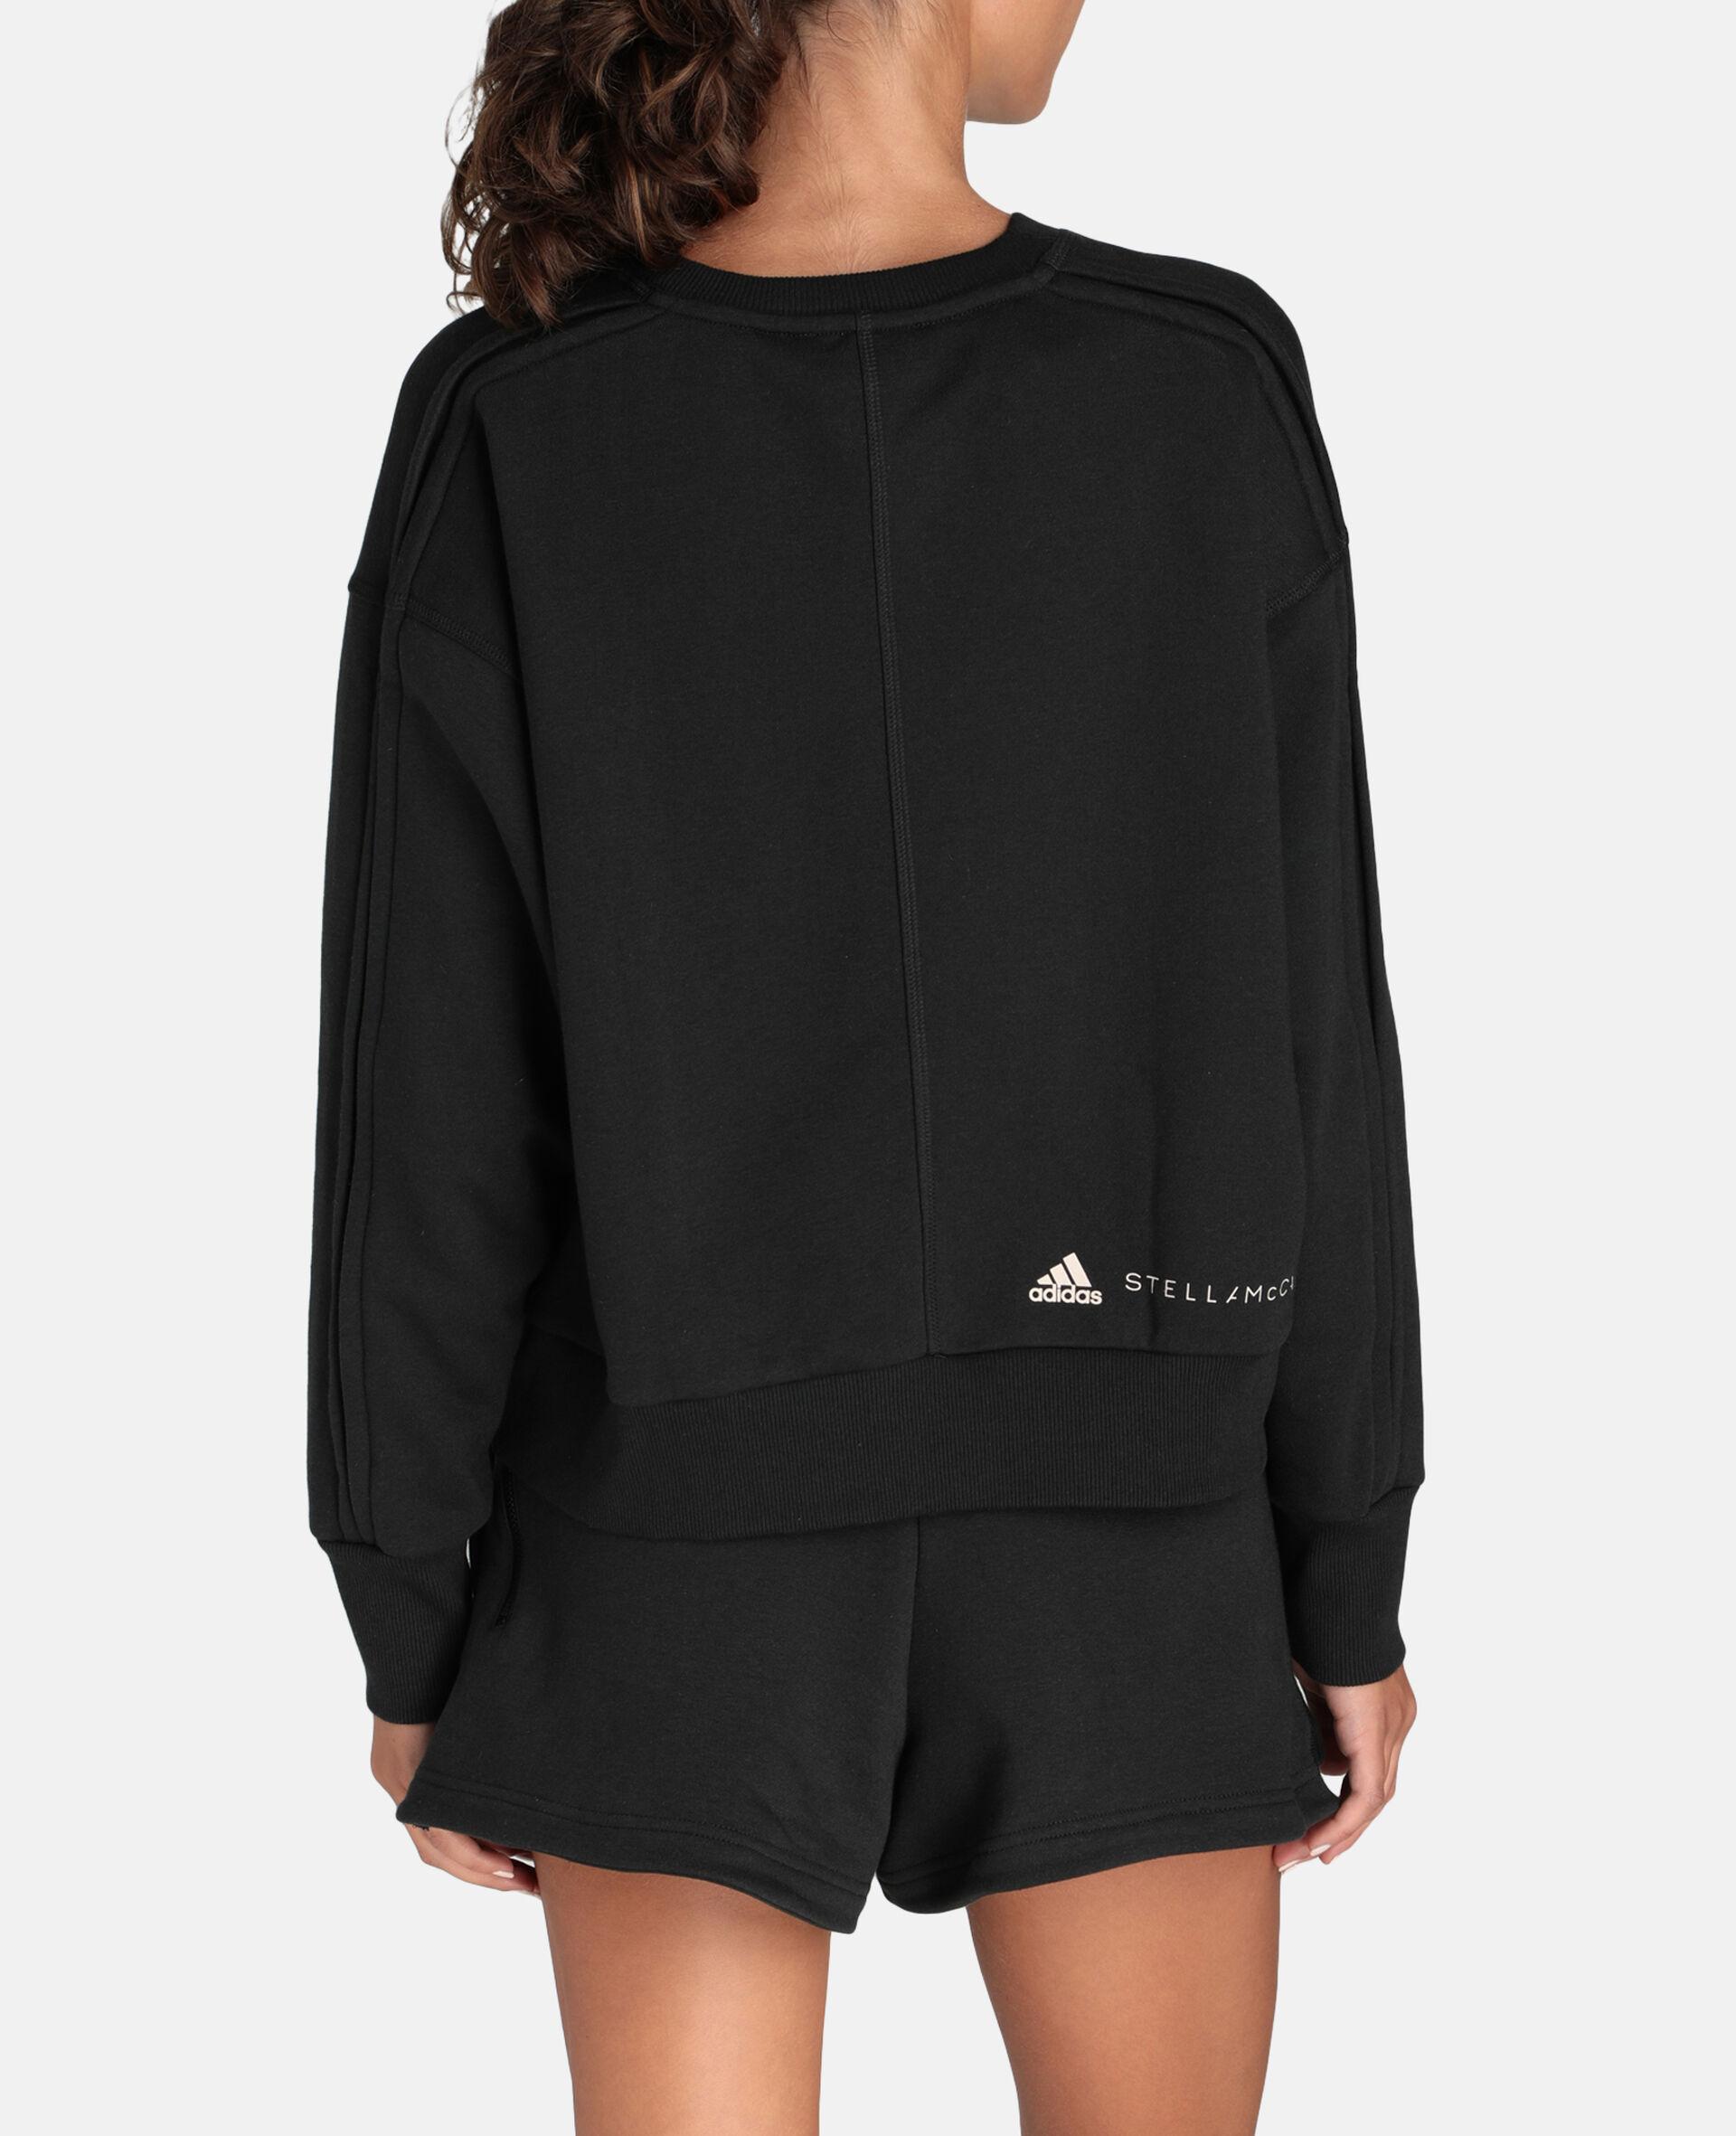 Black Training Sweatshirt-Black-large image number 2